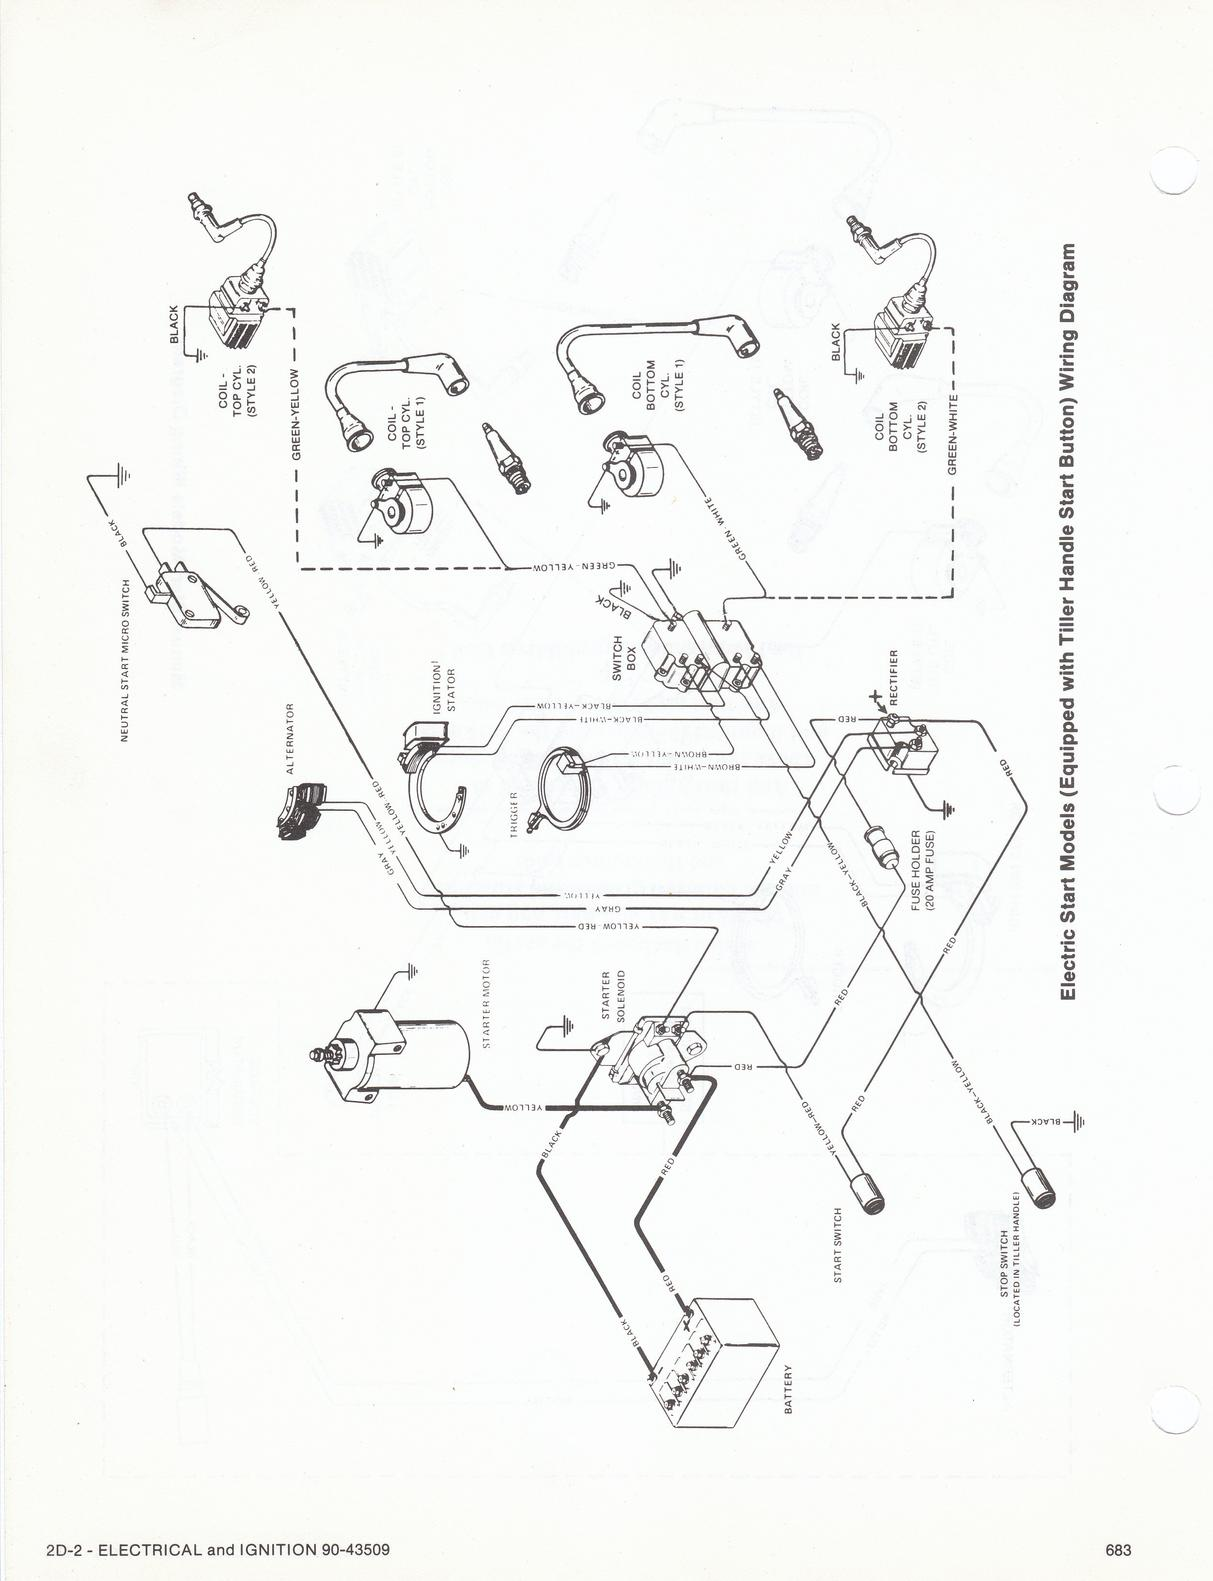 VC_1909] Hp Wiring Diagram As Well 25 Hp Mercury Tiller Handle Conversion  Kit Free DiagramEgre Ultr Mohammedshrine Librar Wiring 101